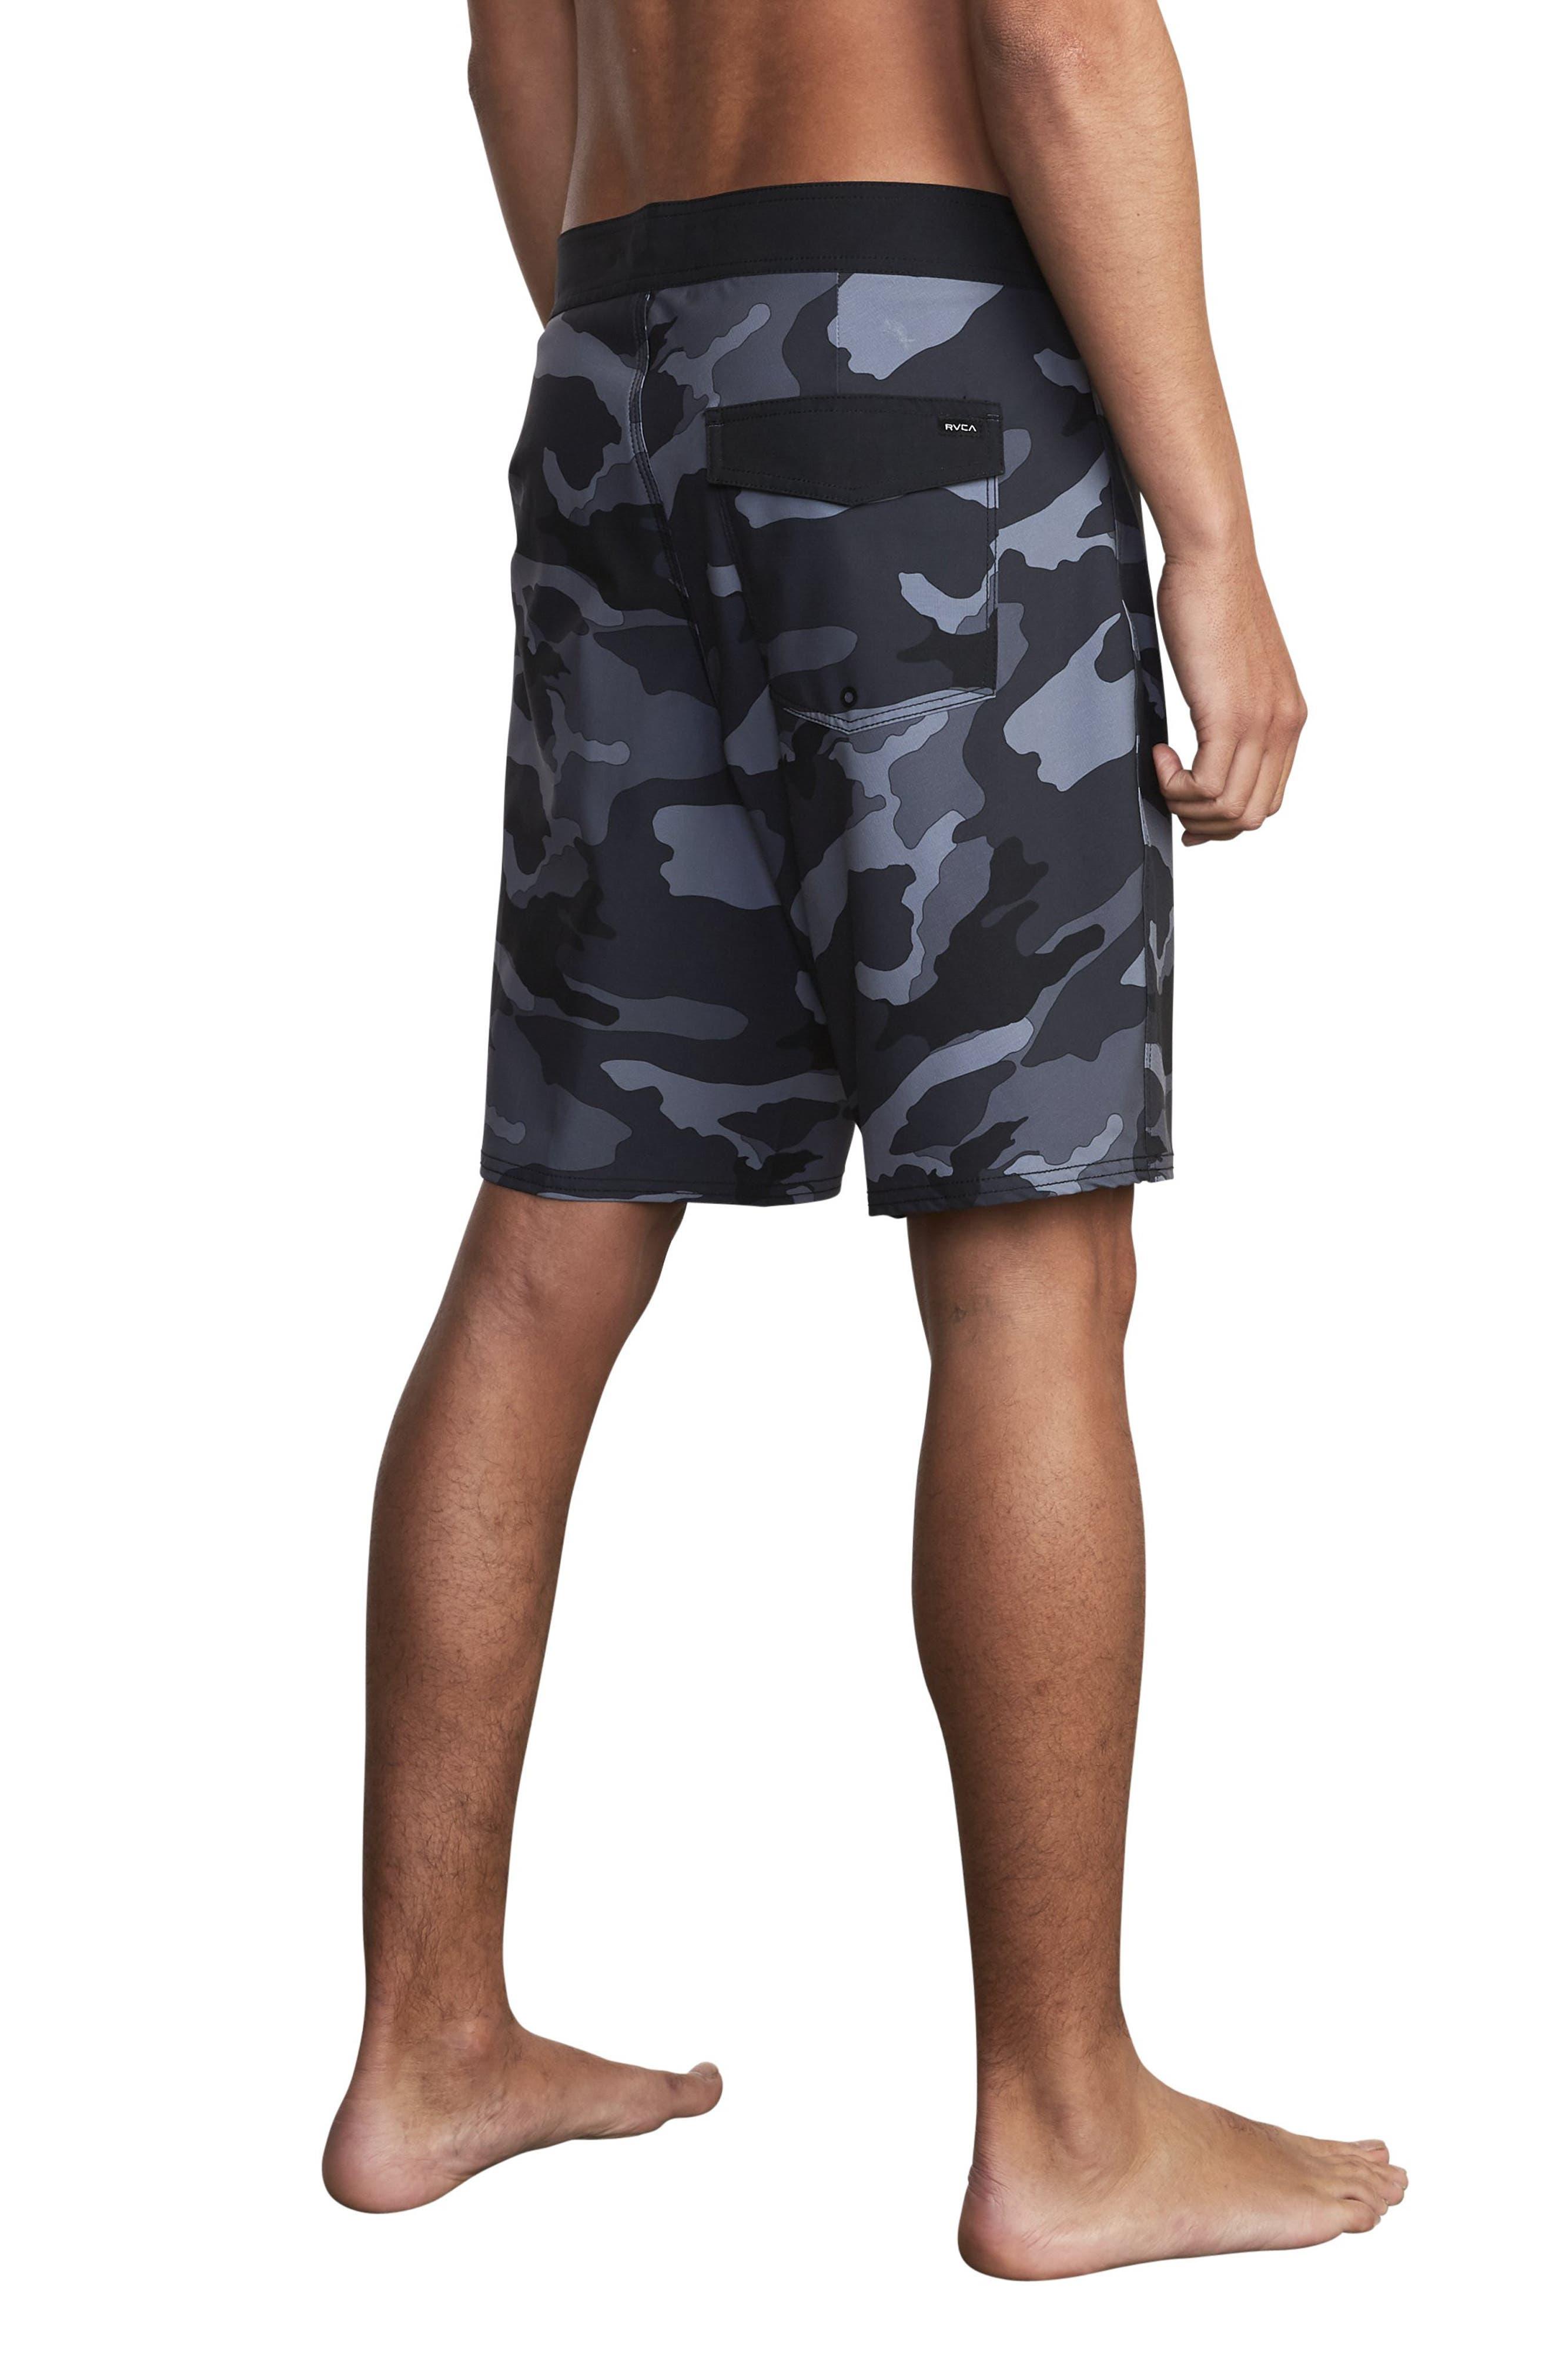 92cf848a8c Men's RVCA Swimwear, Boardshorts & Swim Trunks | Nordstrom